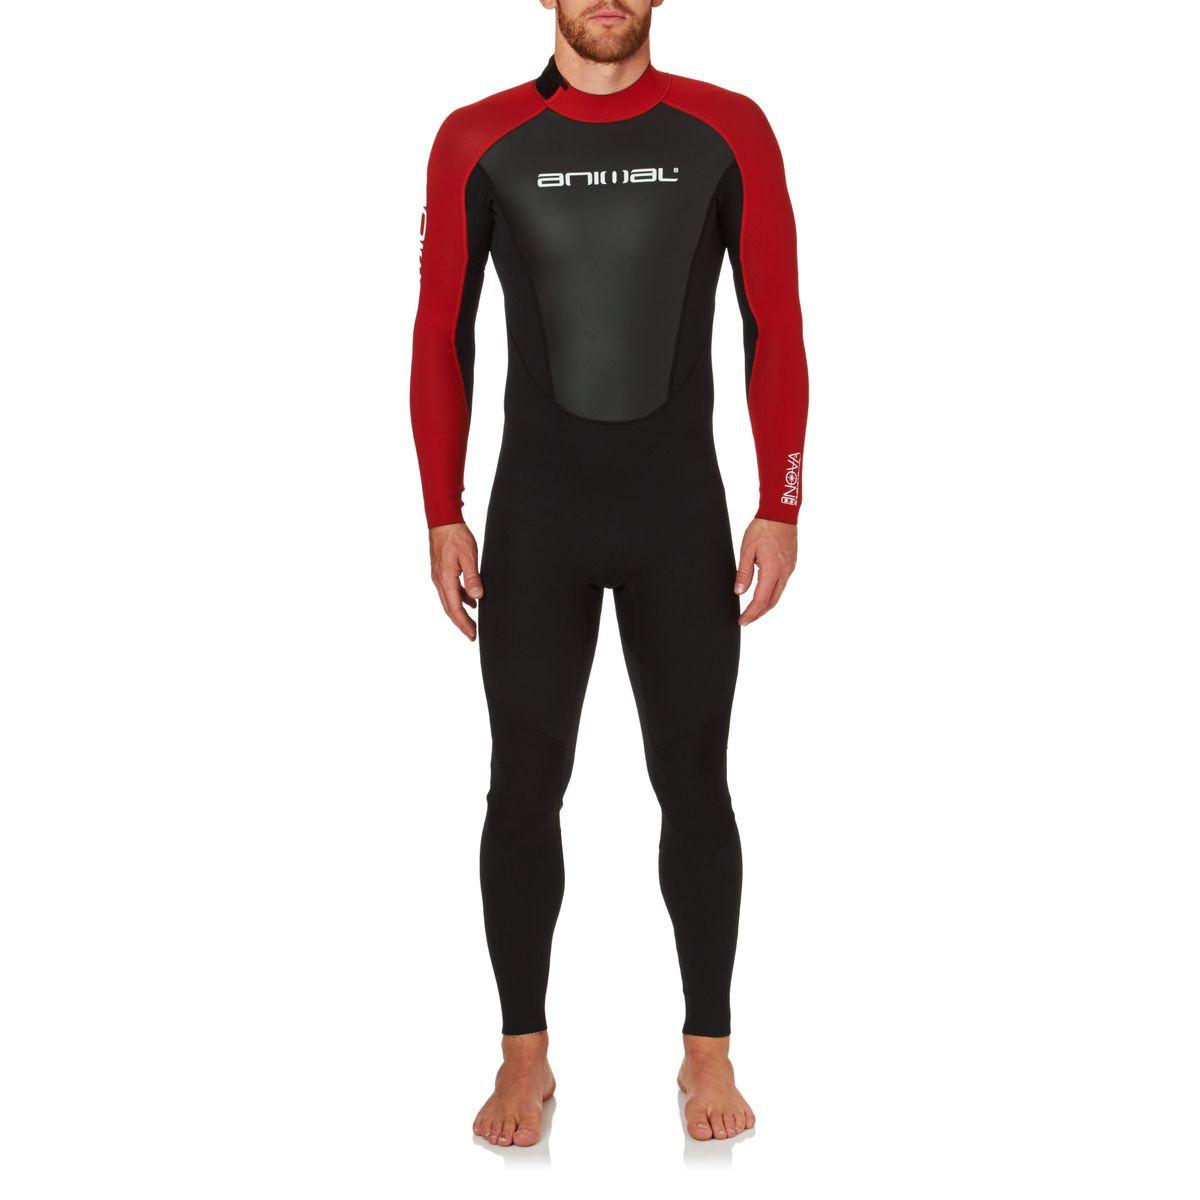 Animal Mens Nova 3/2mm 2017 Back Zip Wetsuit - Bright Red